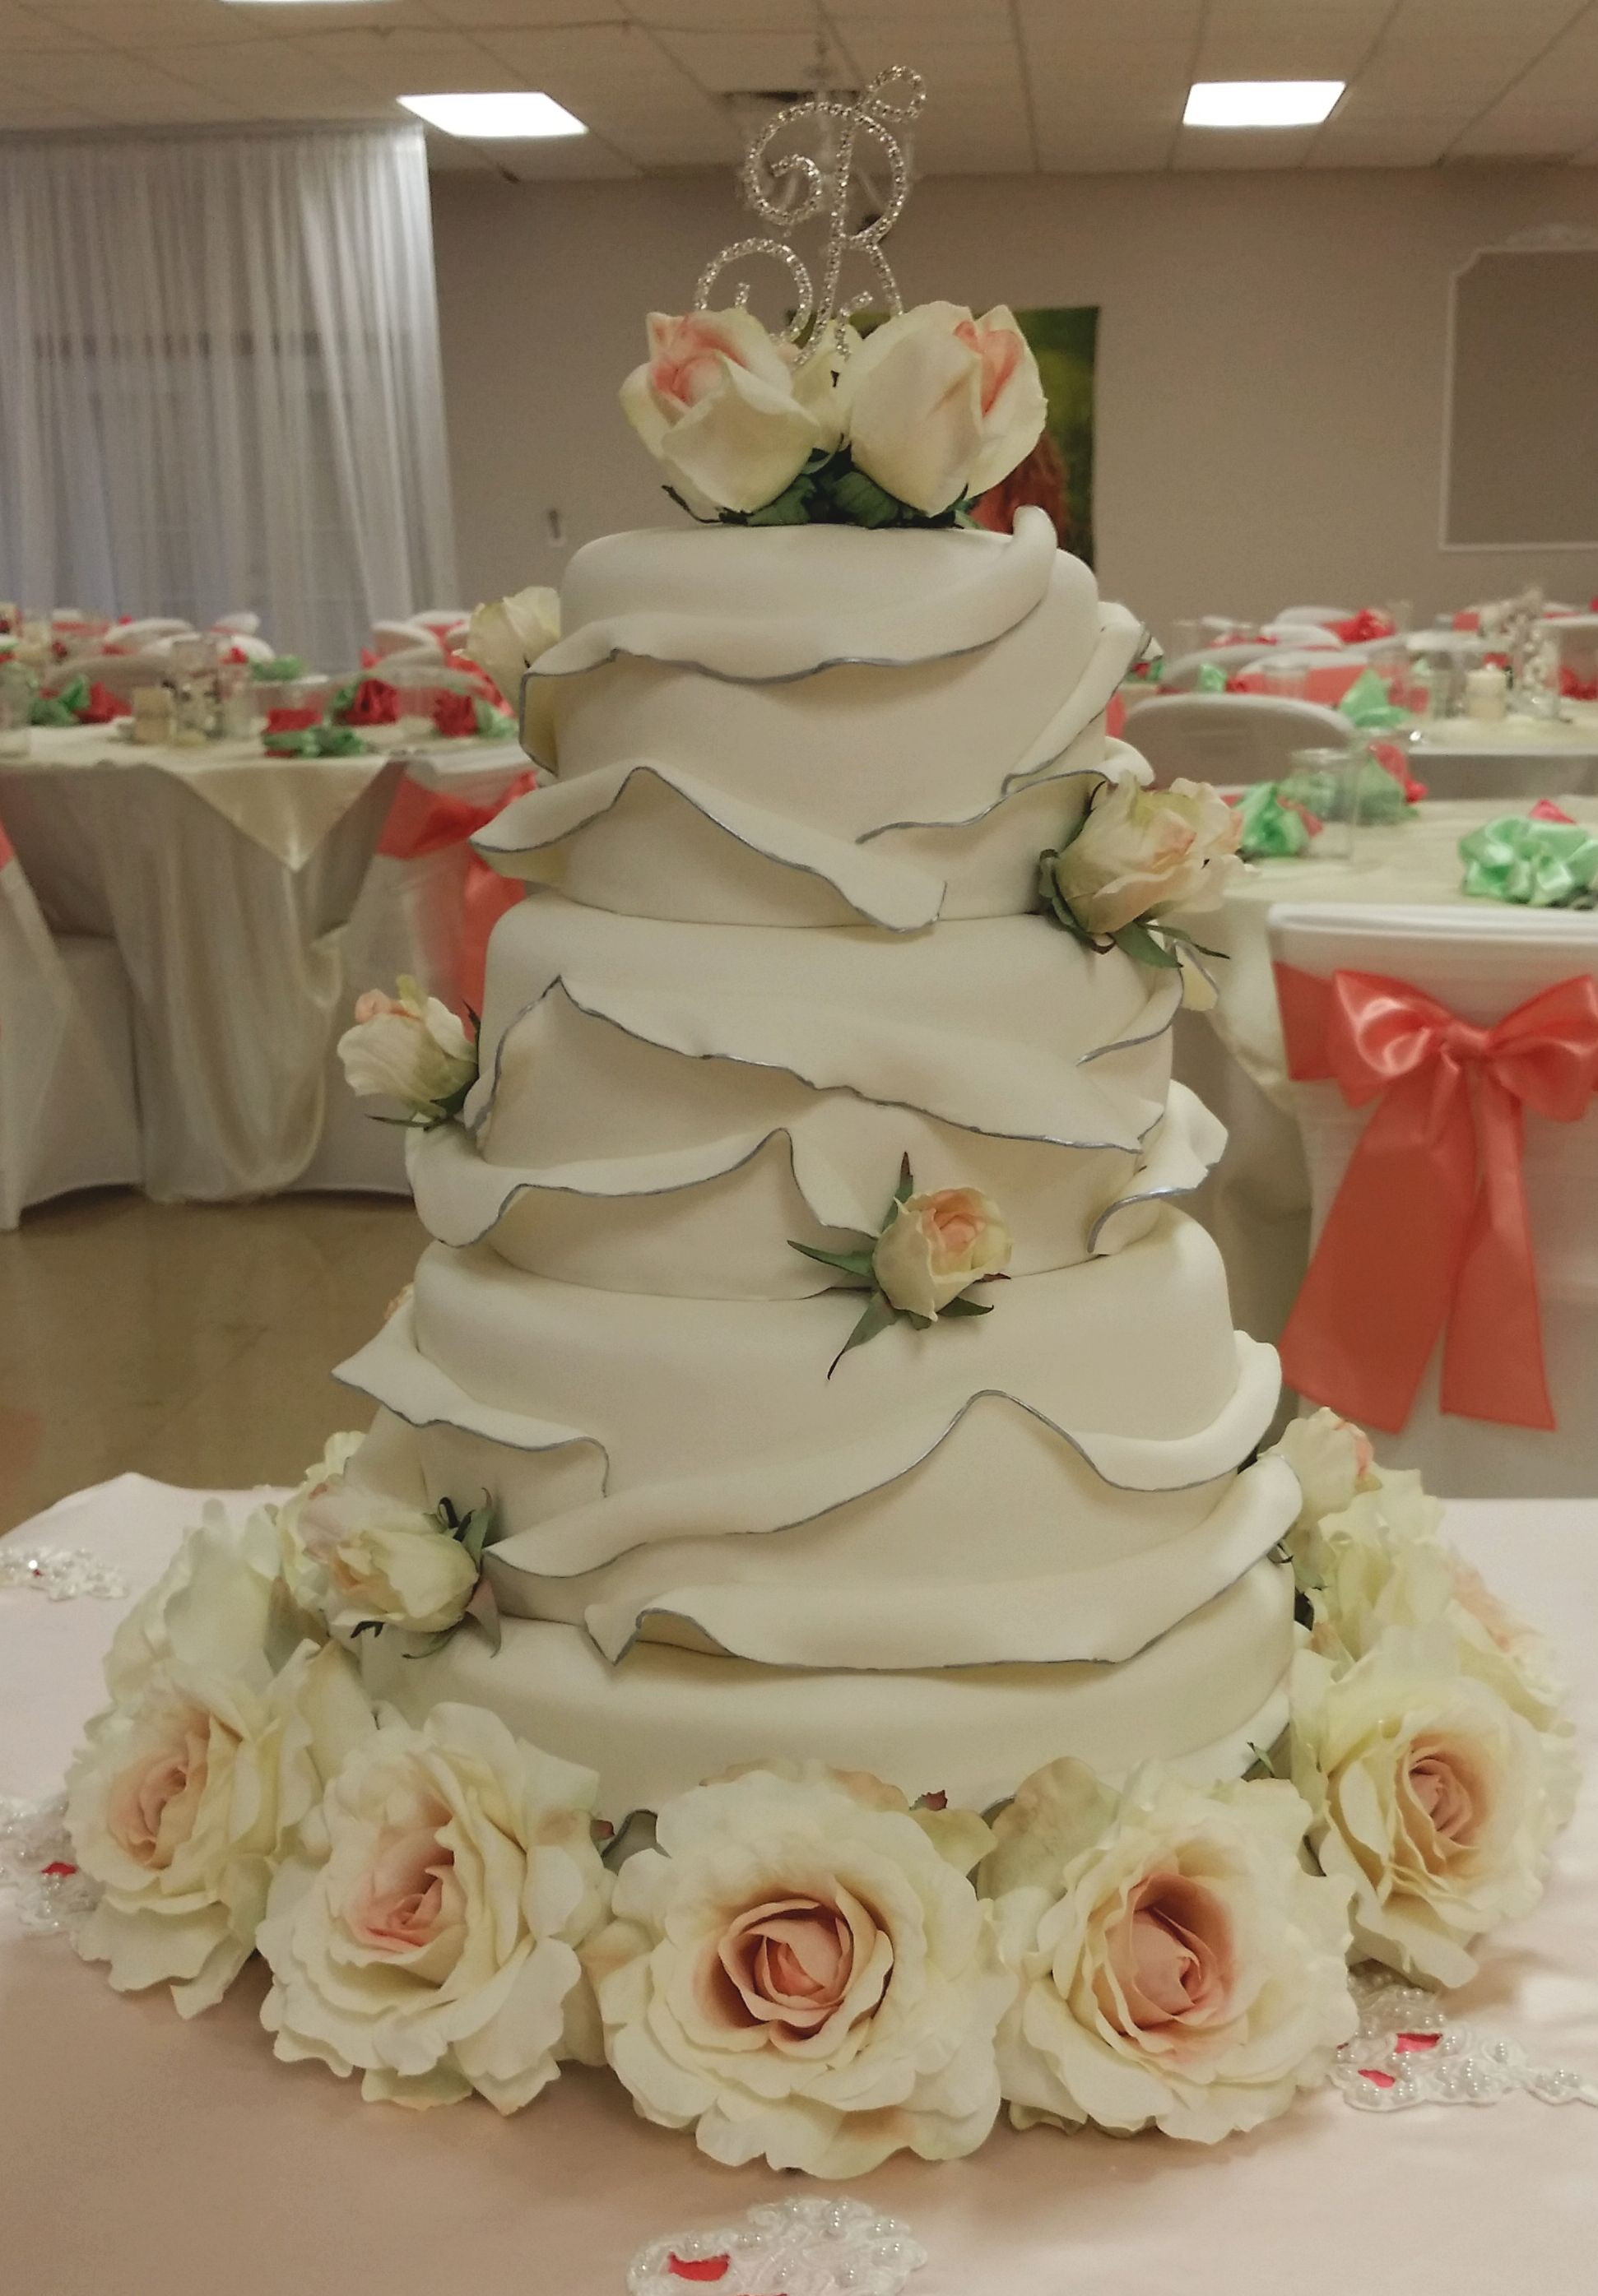 Wedding Cakes Joplin Mo  Wedding Cake Smallcakes of Joplin MO